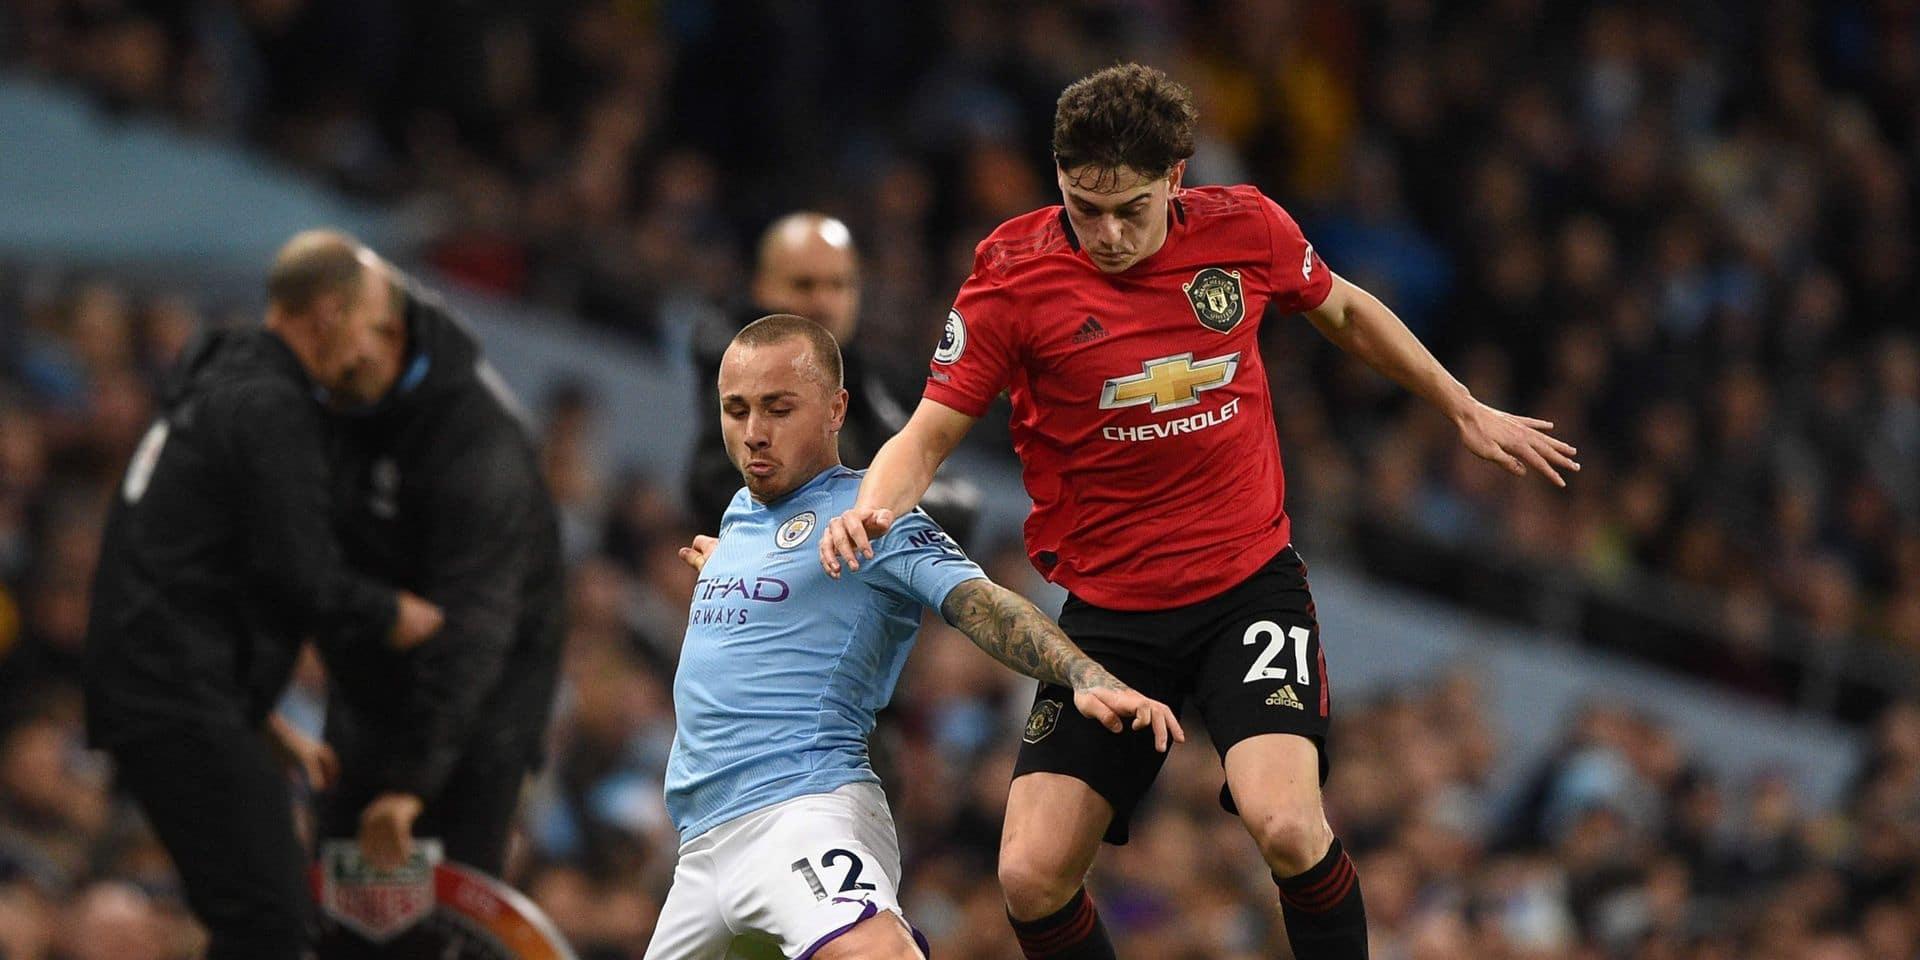 Angleterre: Manchester United terrasse City chez lui